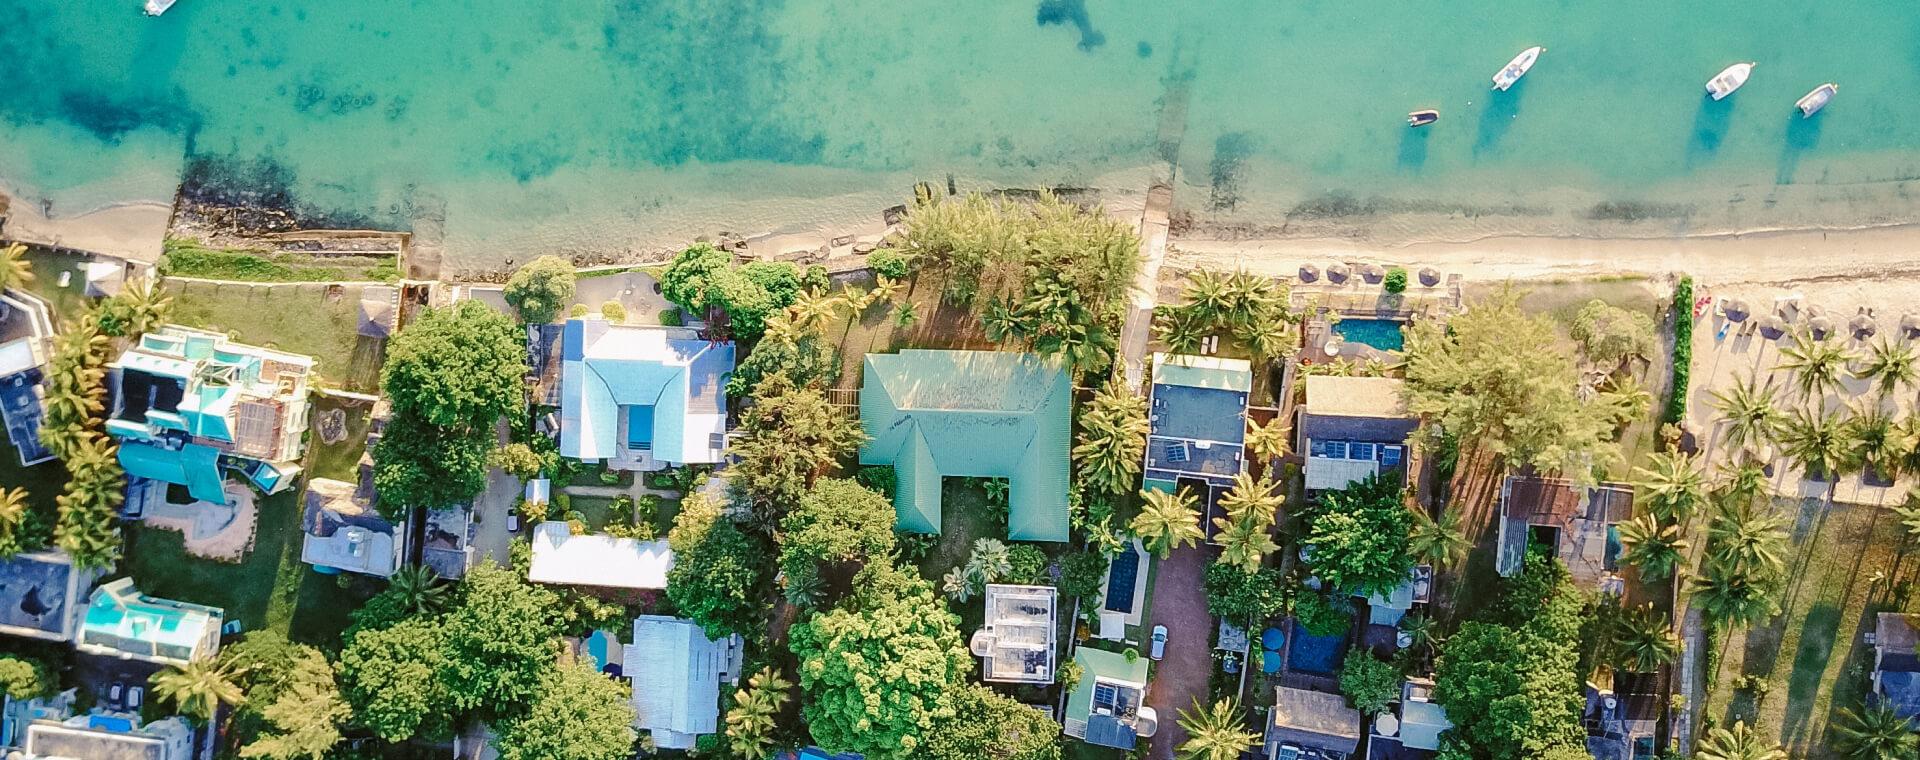 Mauritius risks illustration